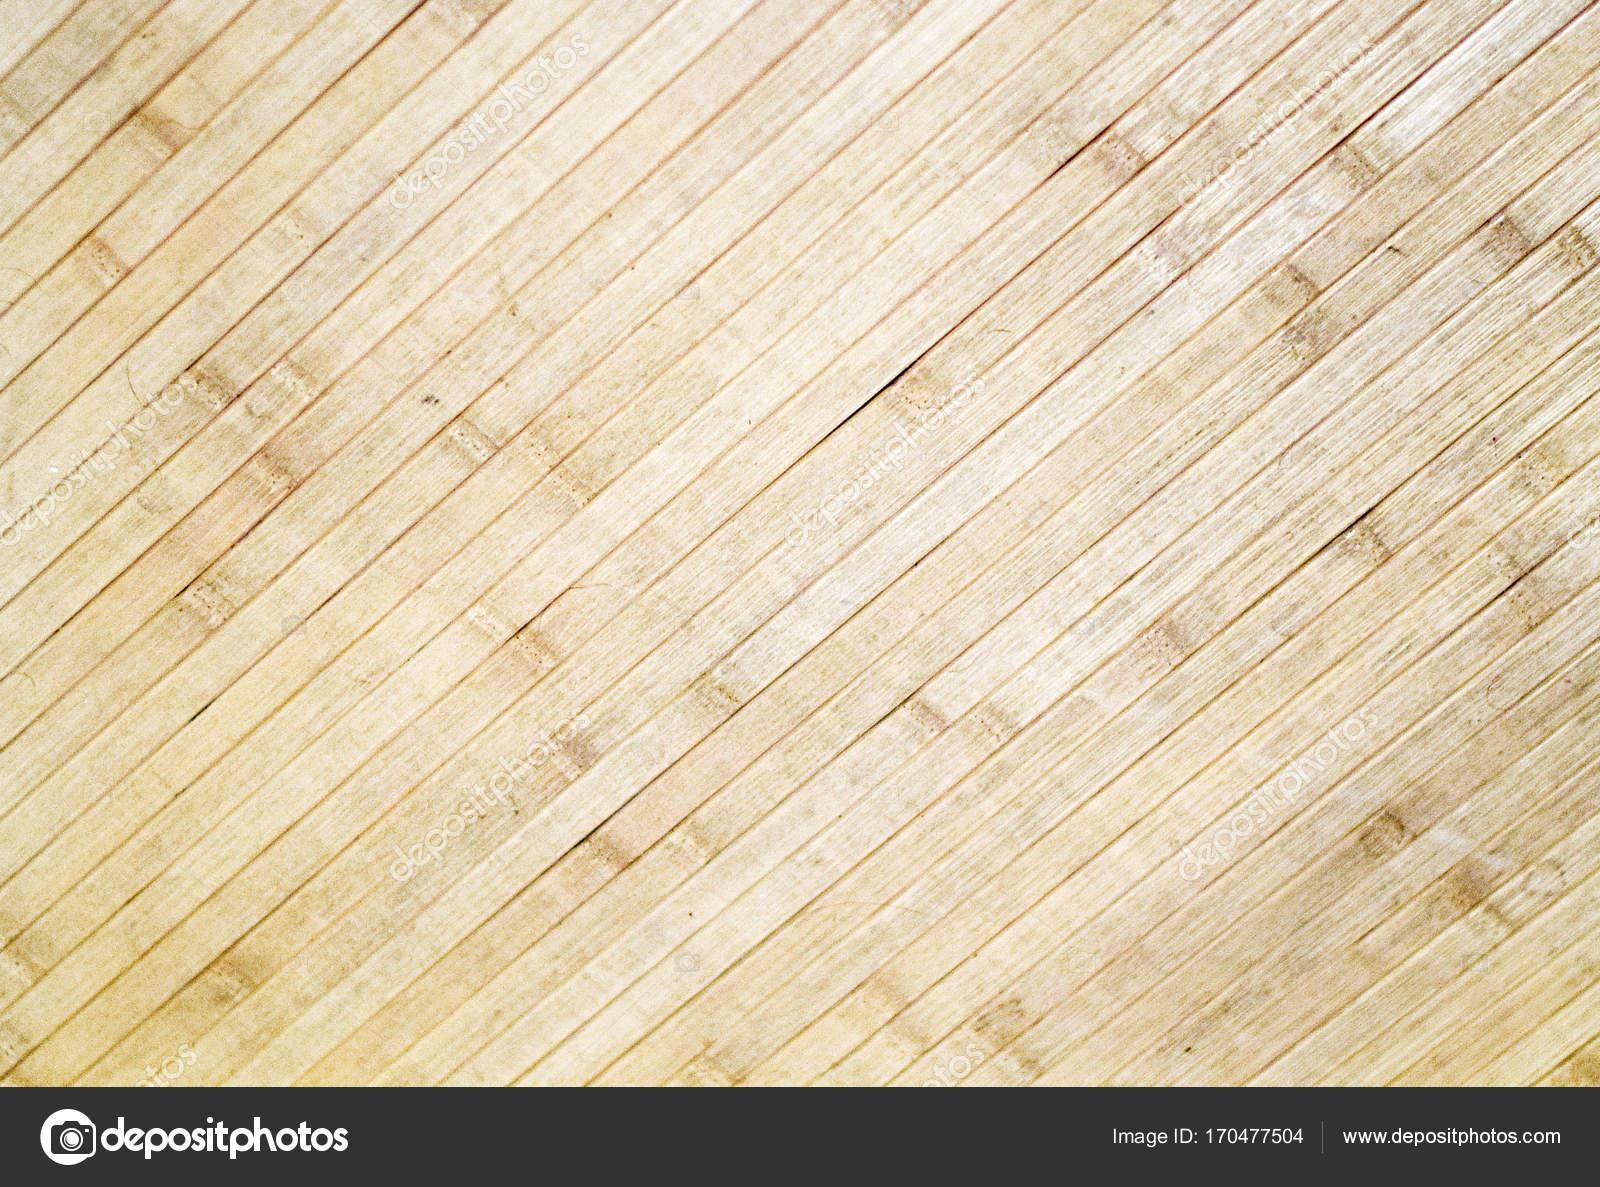 Tatami Bambusmatte Auf Etage Stockfoto C Cabecademarmore 170477504